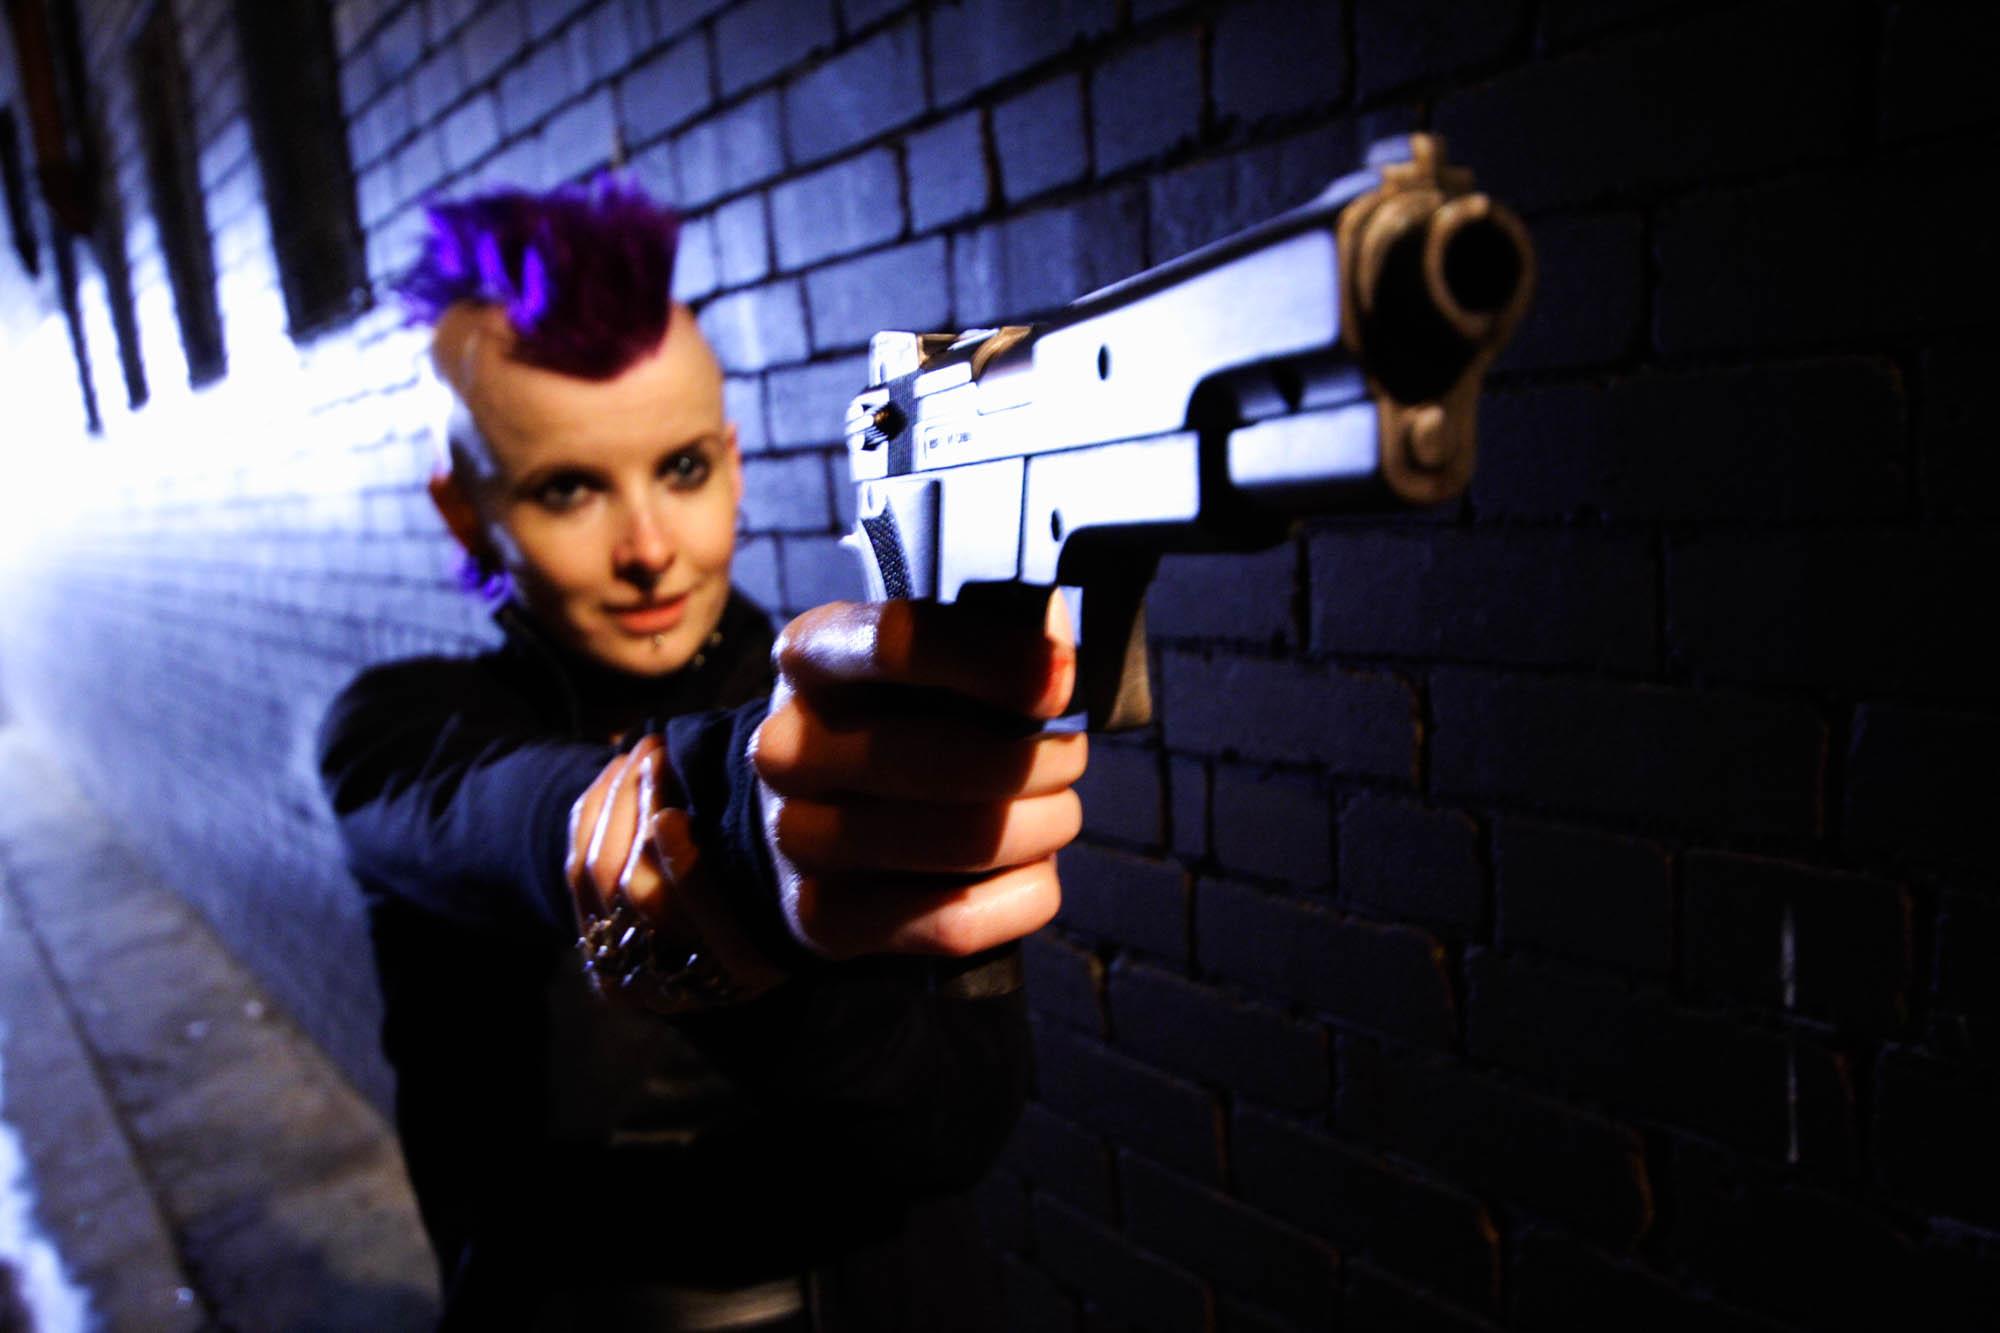 Rhetta-Punk-Girl-Film-Still-Alley-Gun-Night-Redfern_0151.jpg